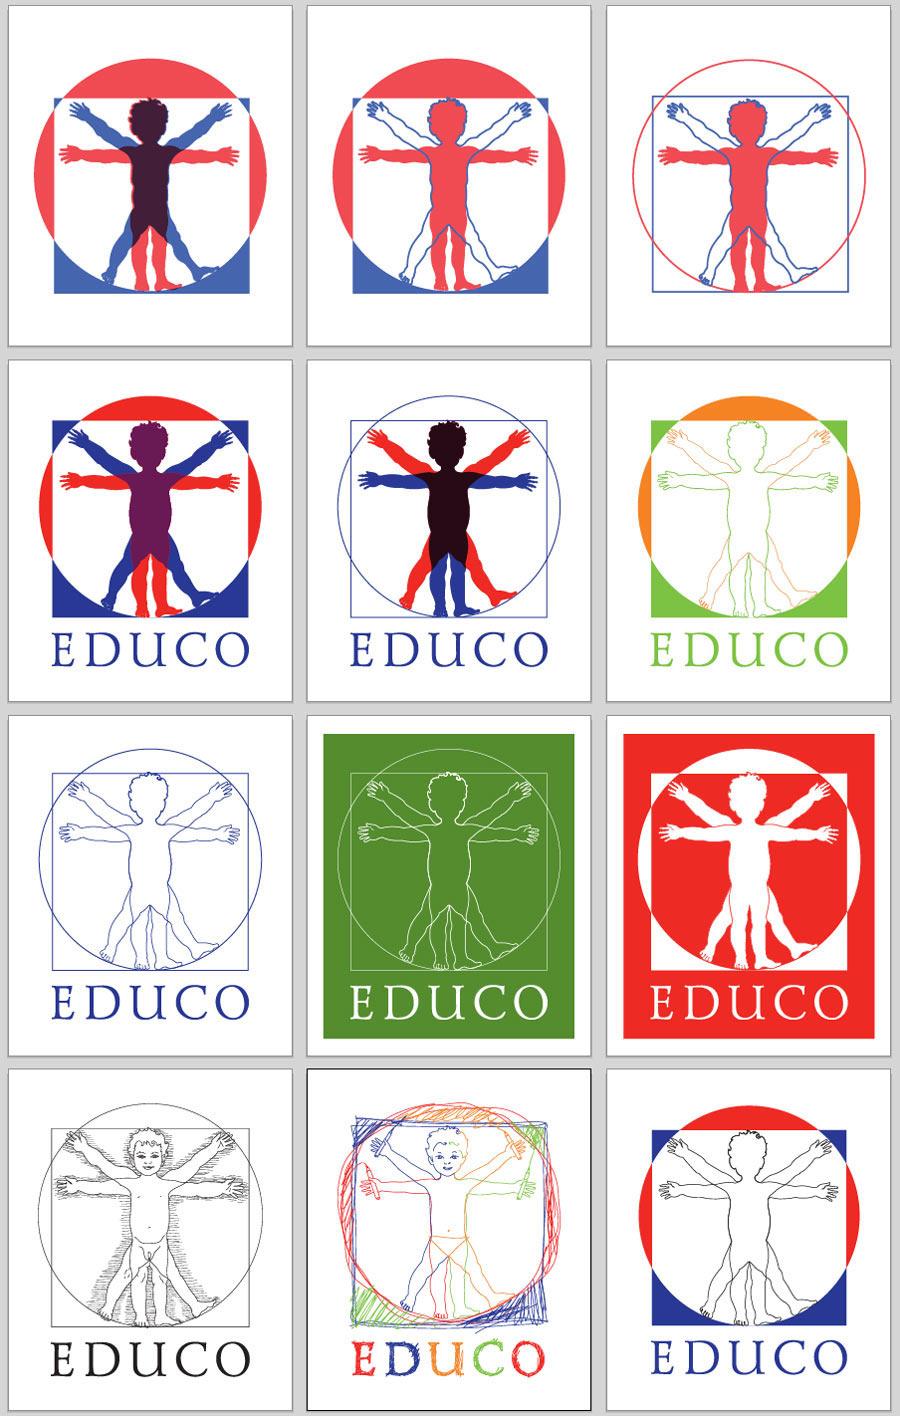 educo-process-05